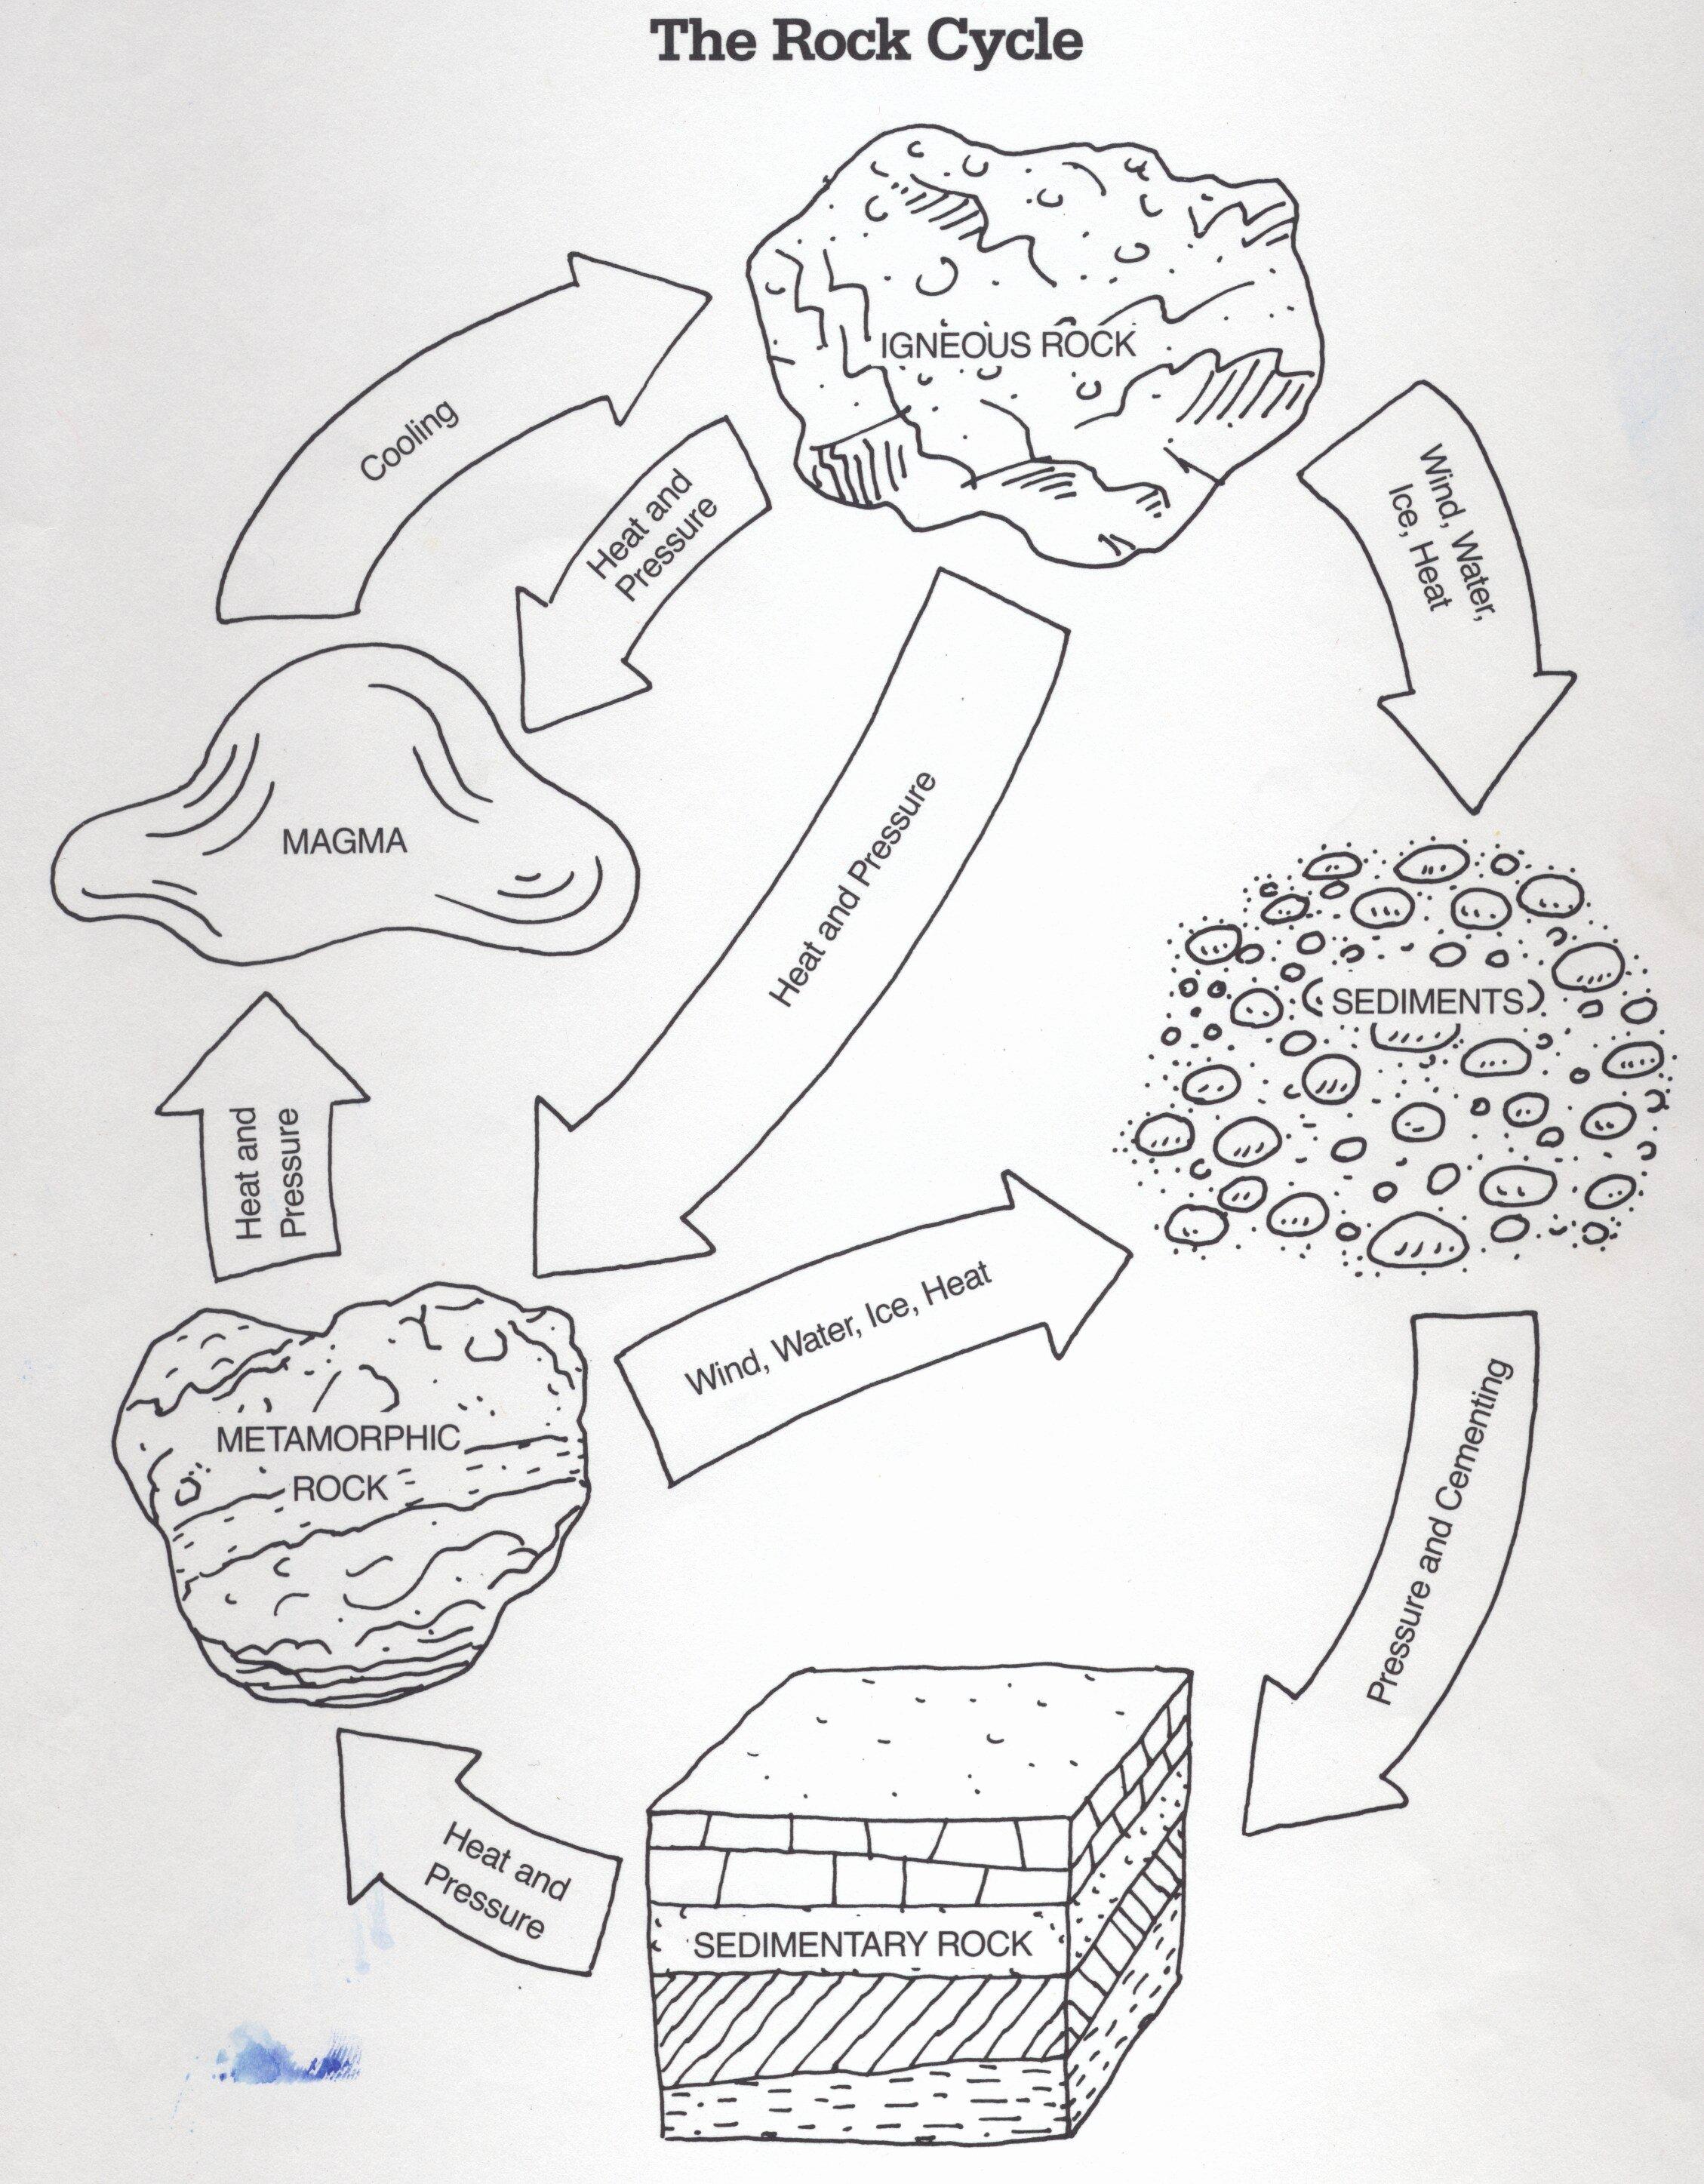 Rock Cycle Diagram Worksheet Lovely Rock Cycle